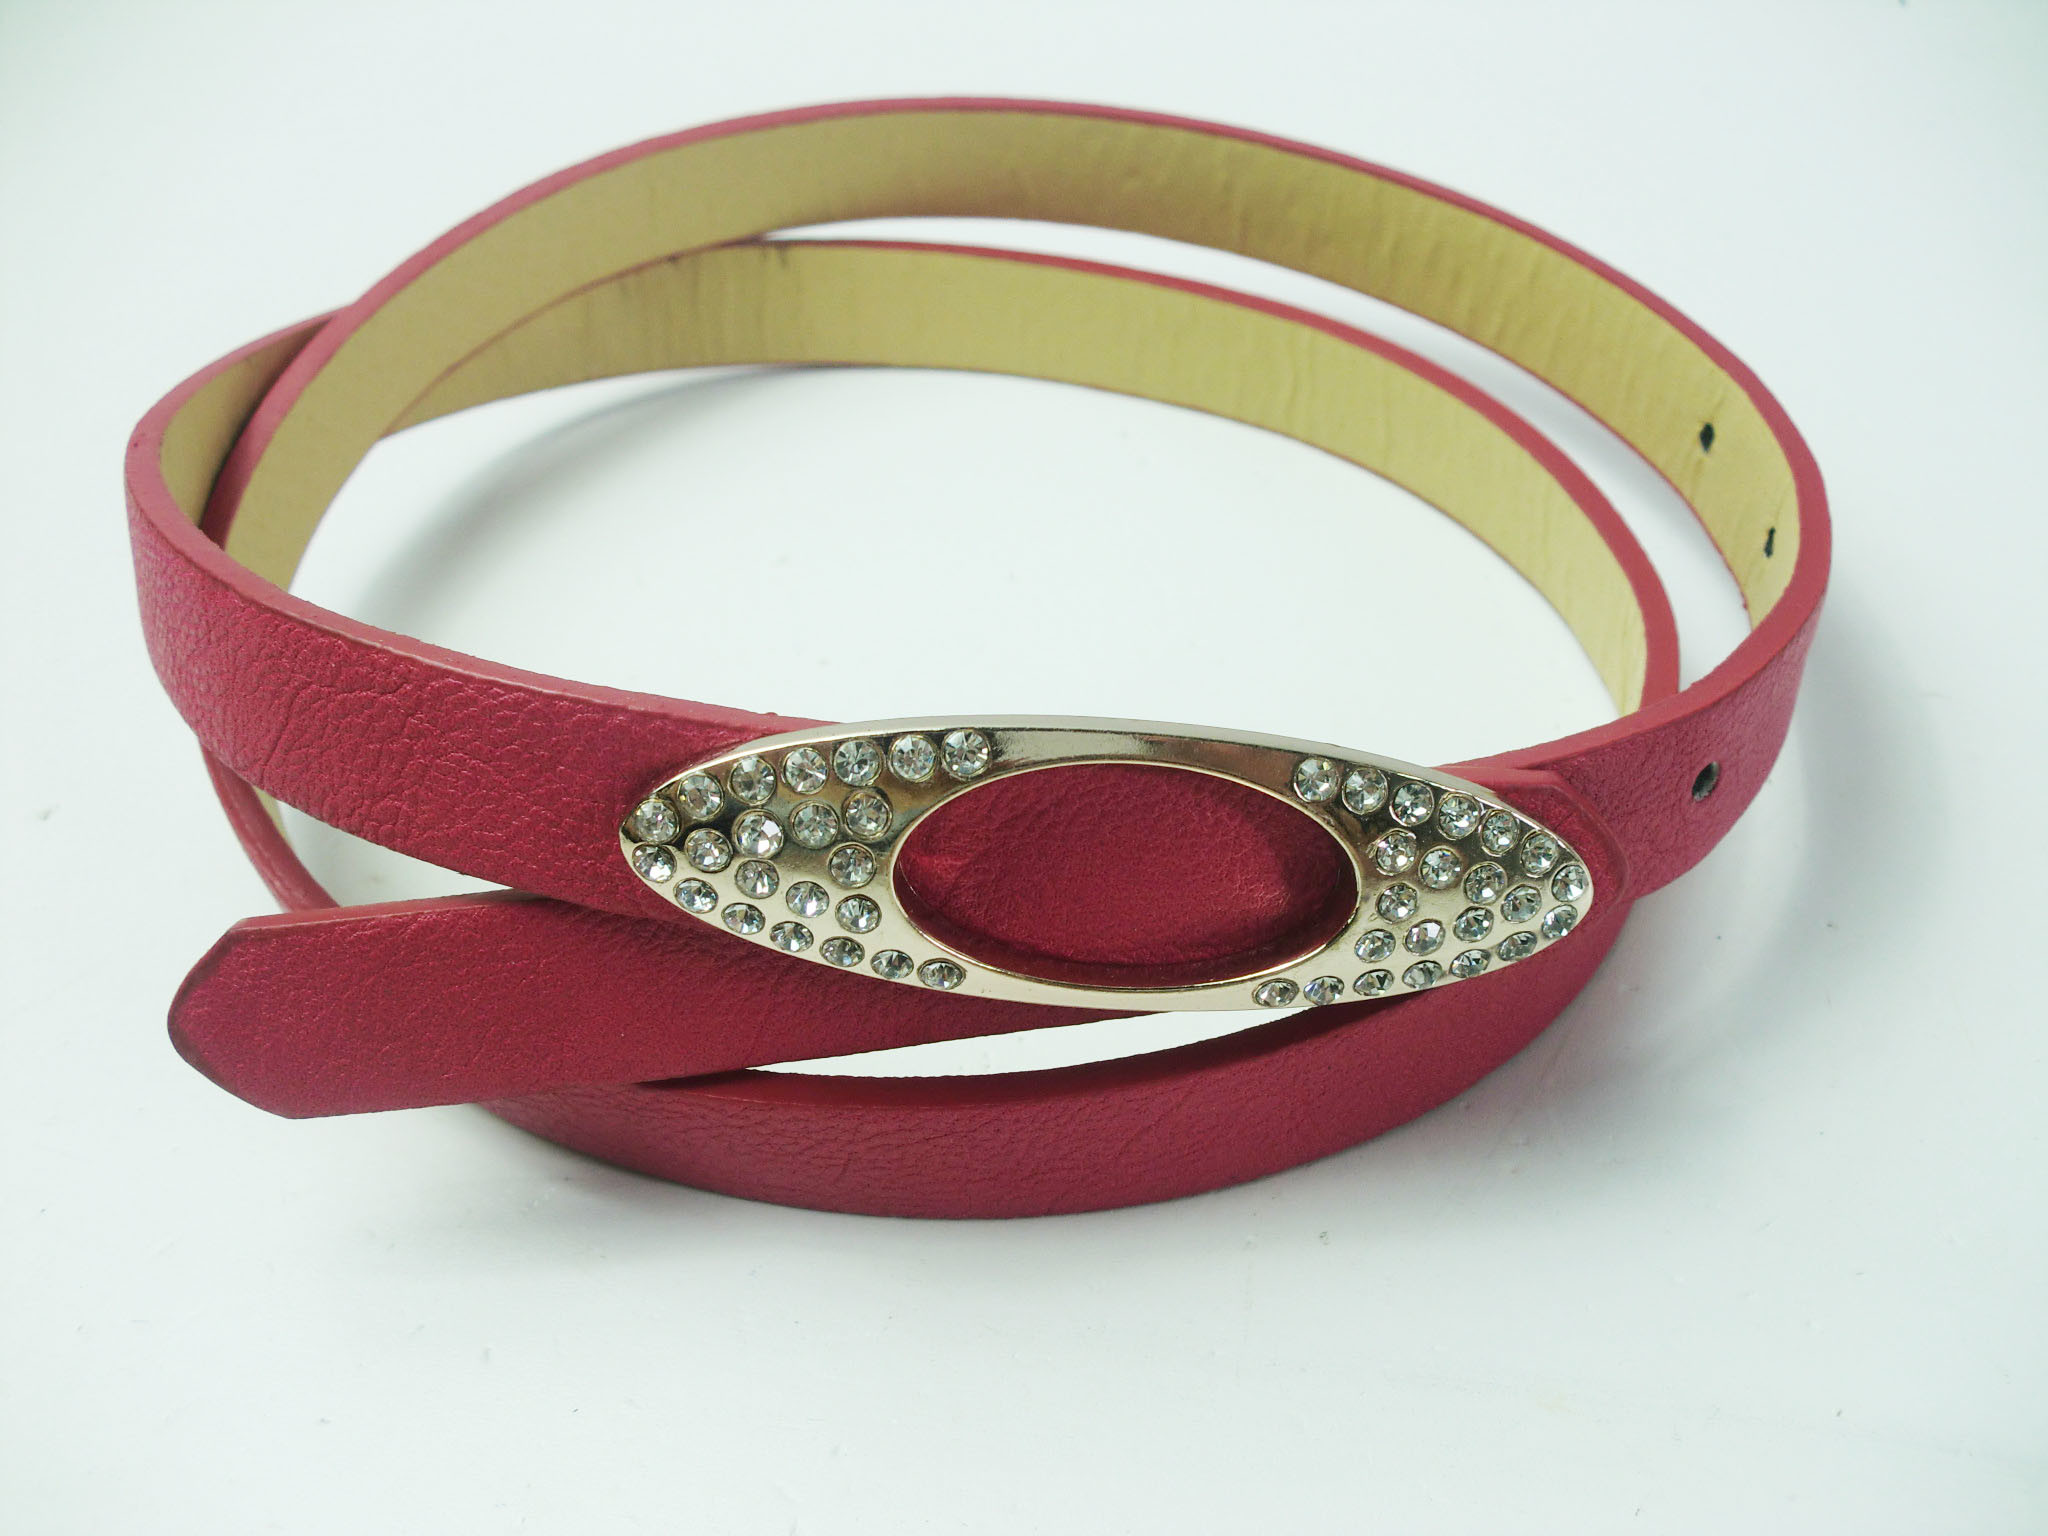 PU Belt Approval by ITS (JB2012061413)